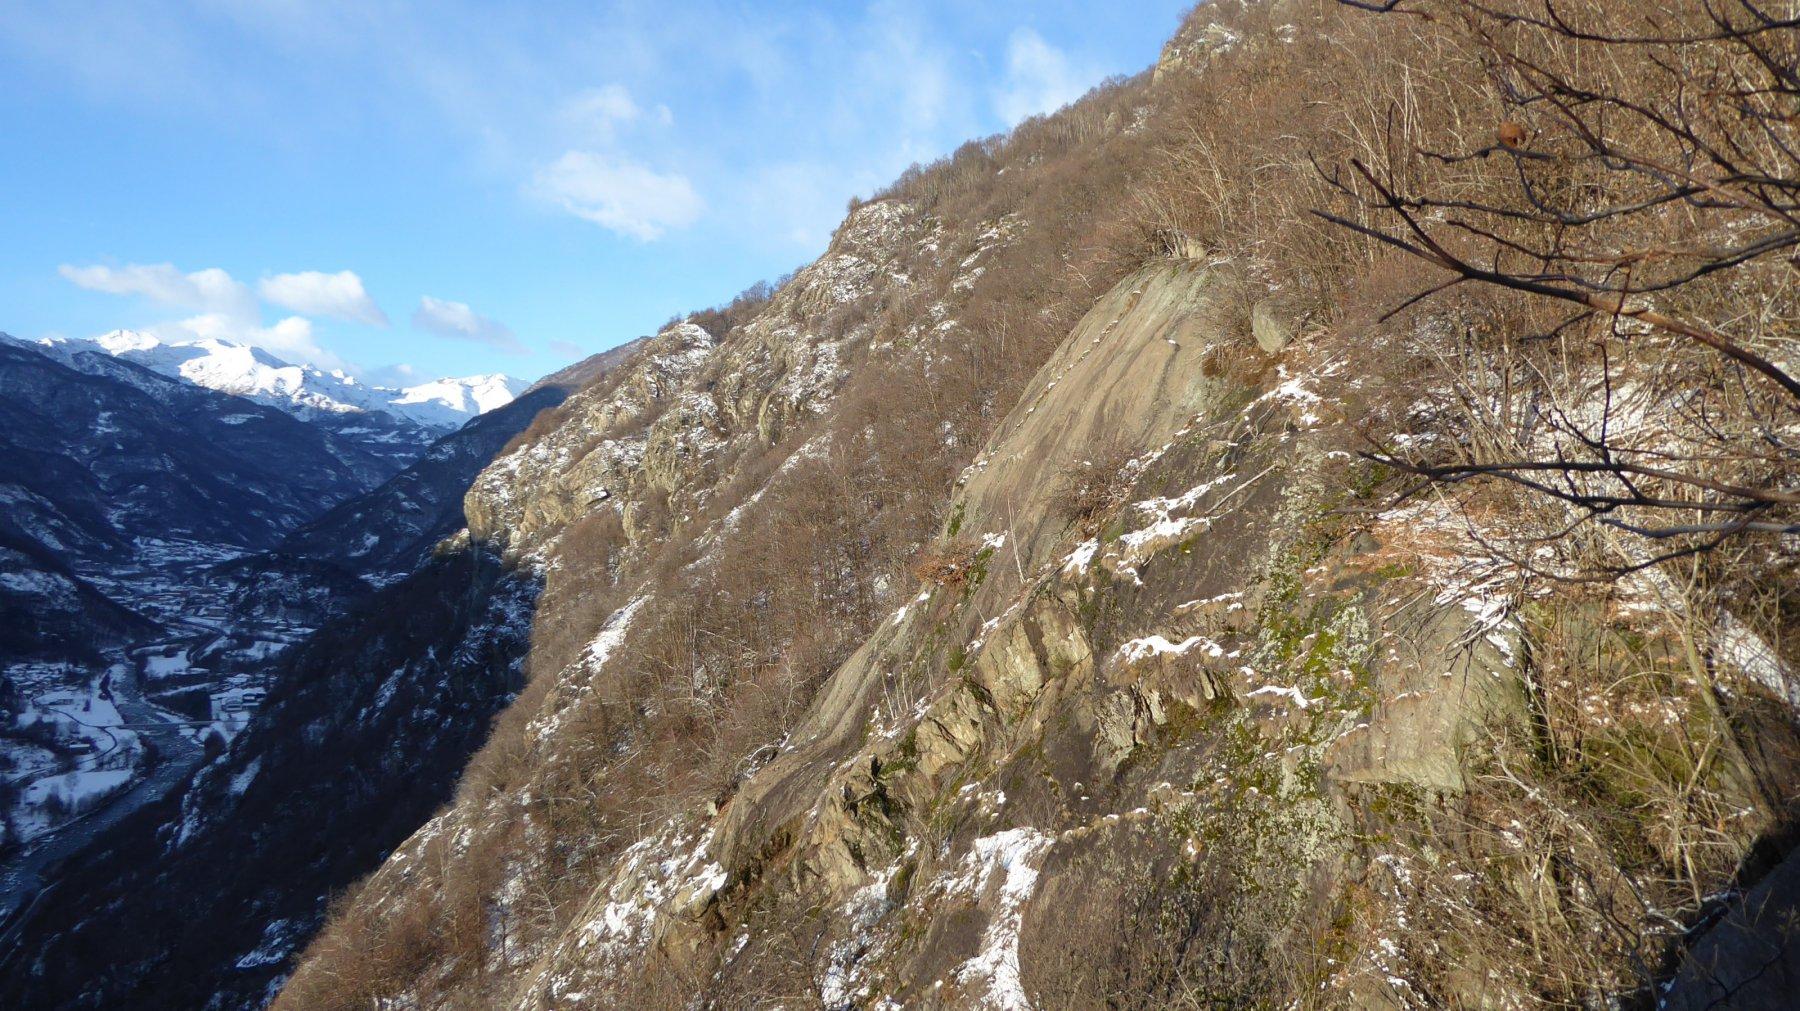 Punto Panoramico sul sentiero di Piancerese